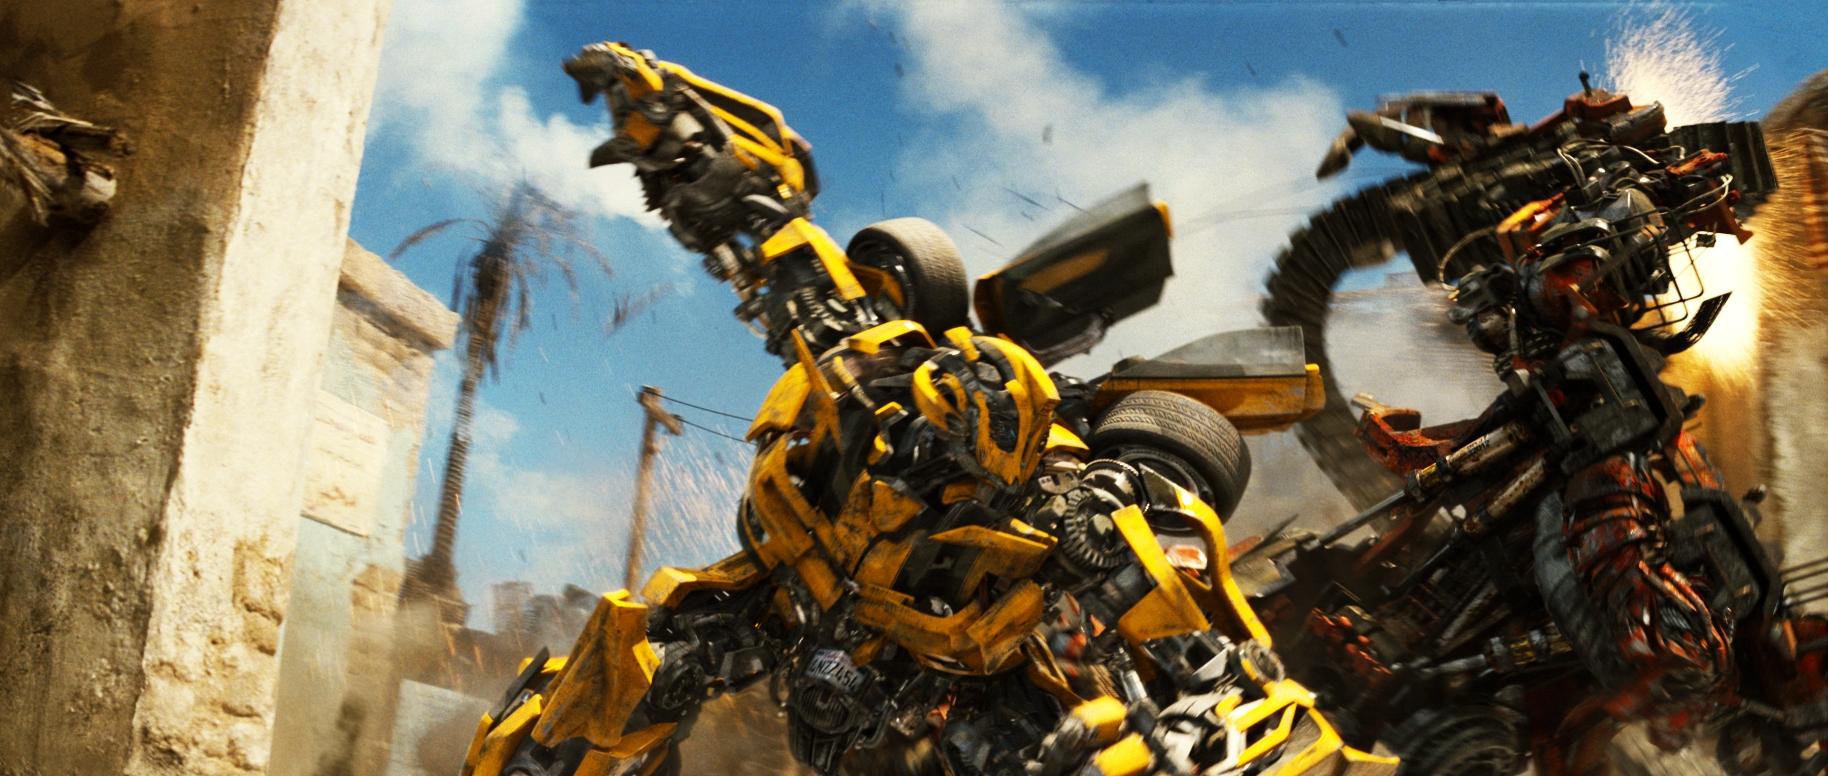 Transformers 3 - Transformers 2: Revenge of the Fallen